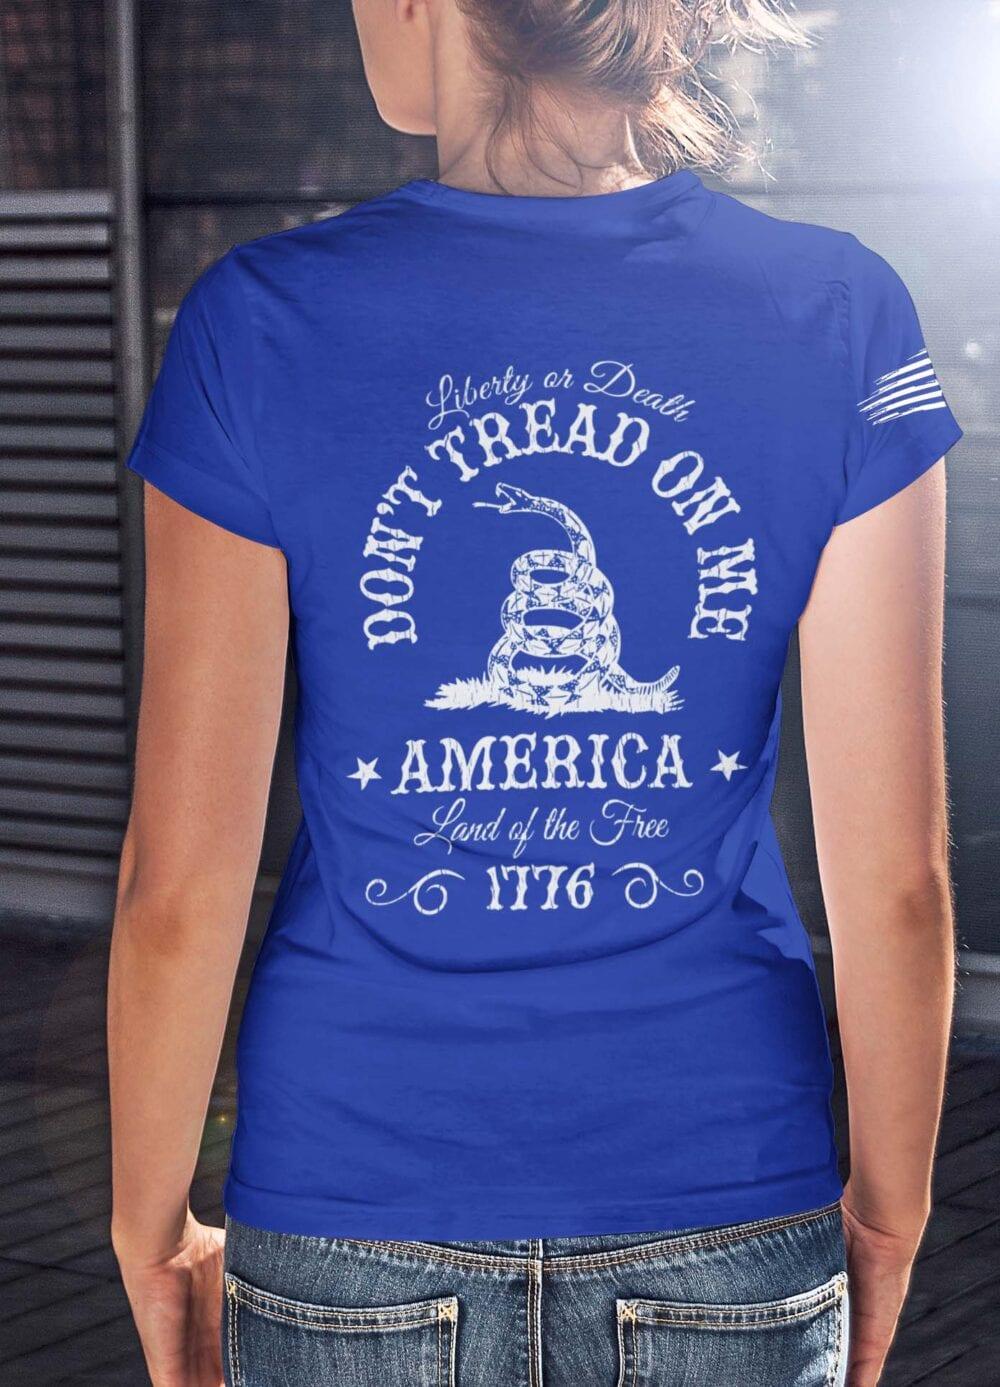 Don't Tread On me on Women's Royal Blue Shirt